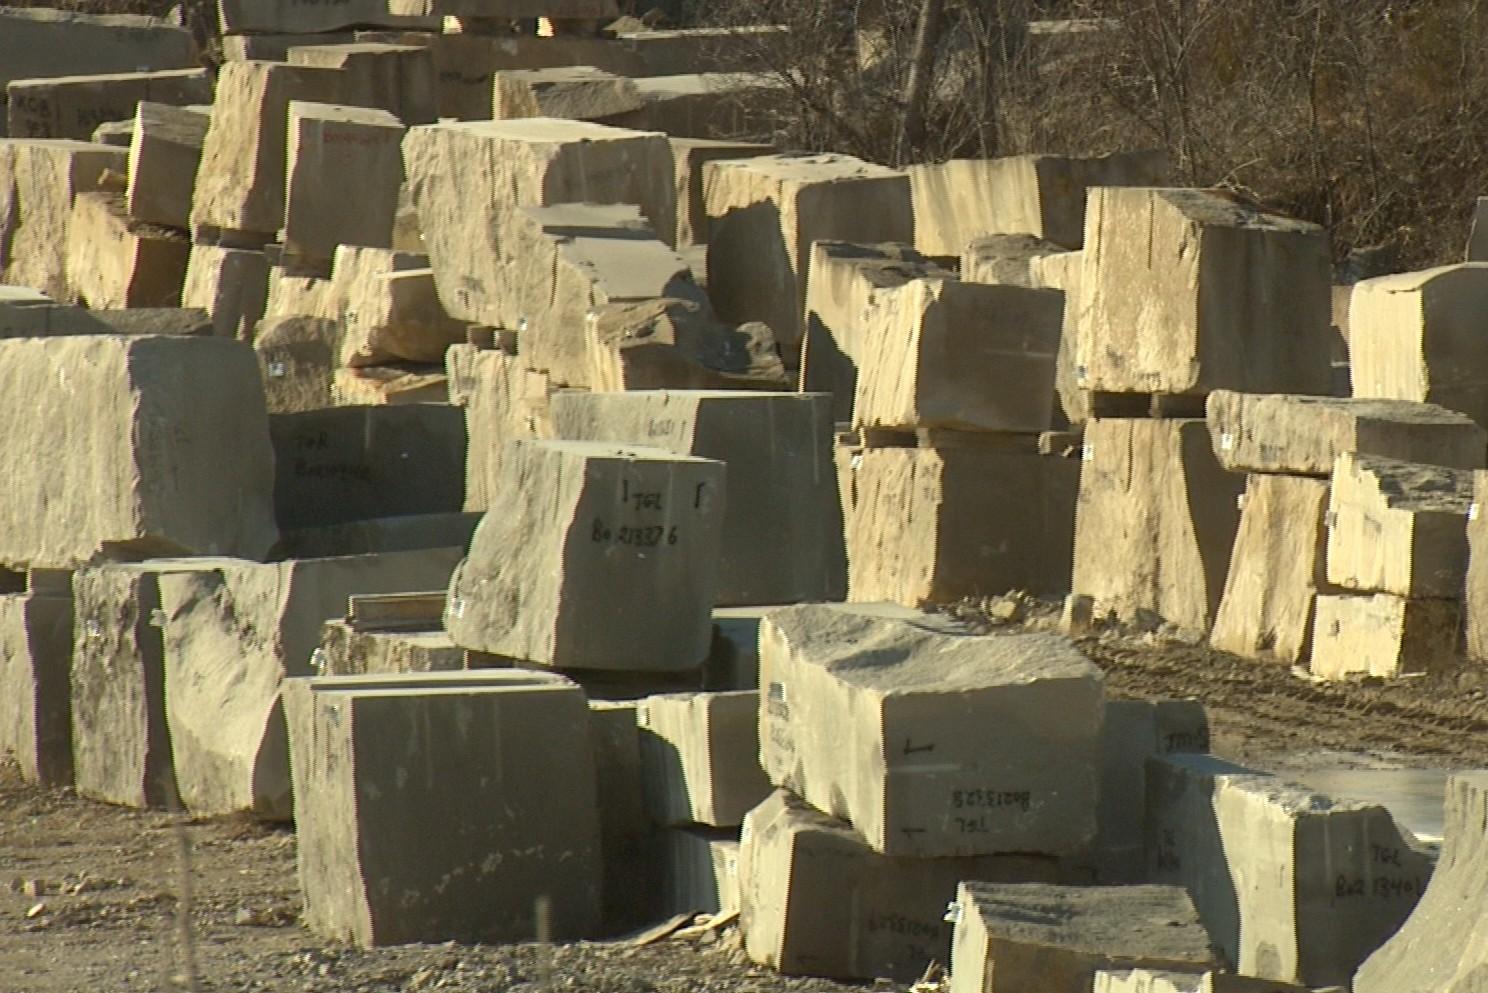 Limestone stacks at the Indiana Limestone Company